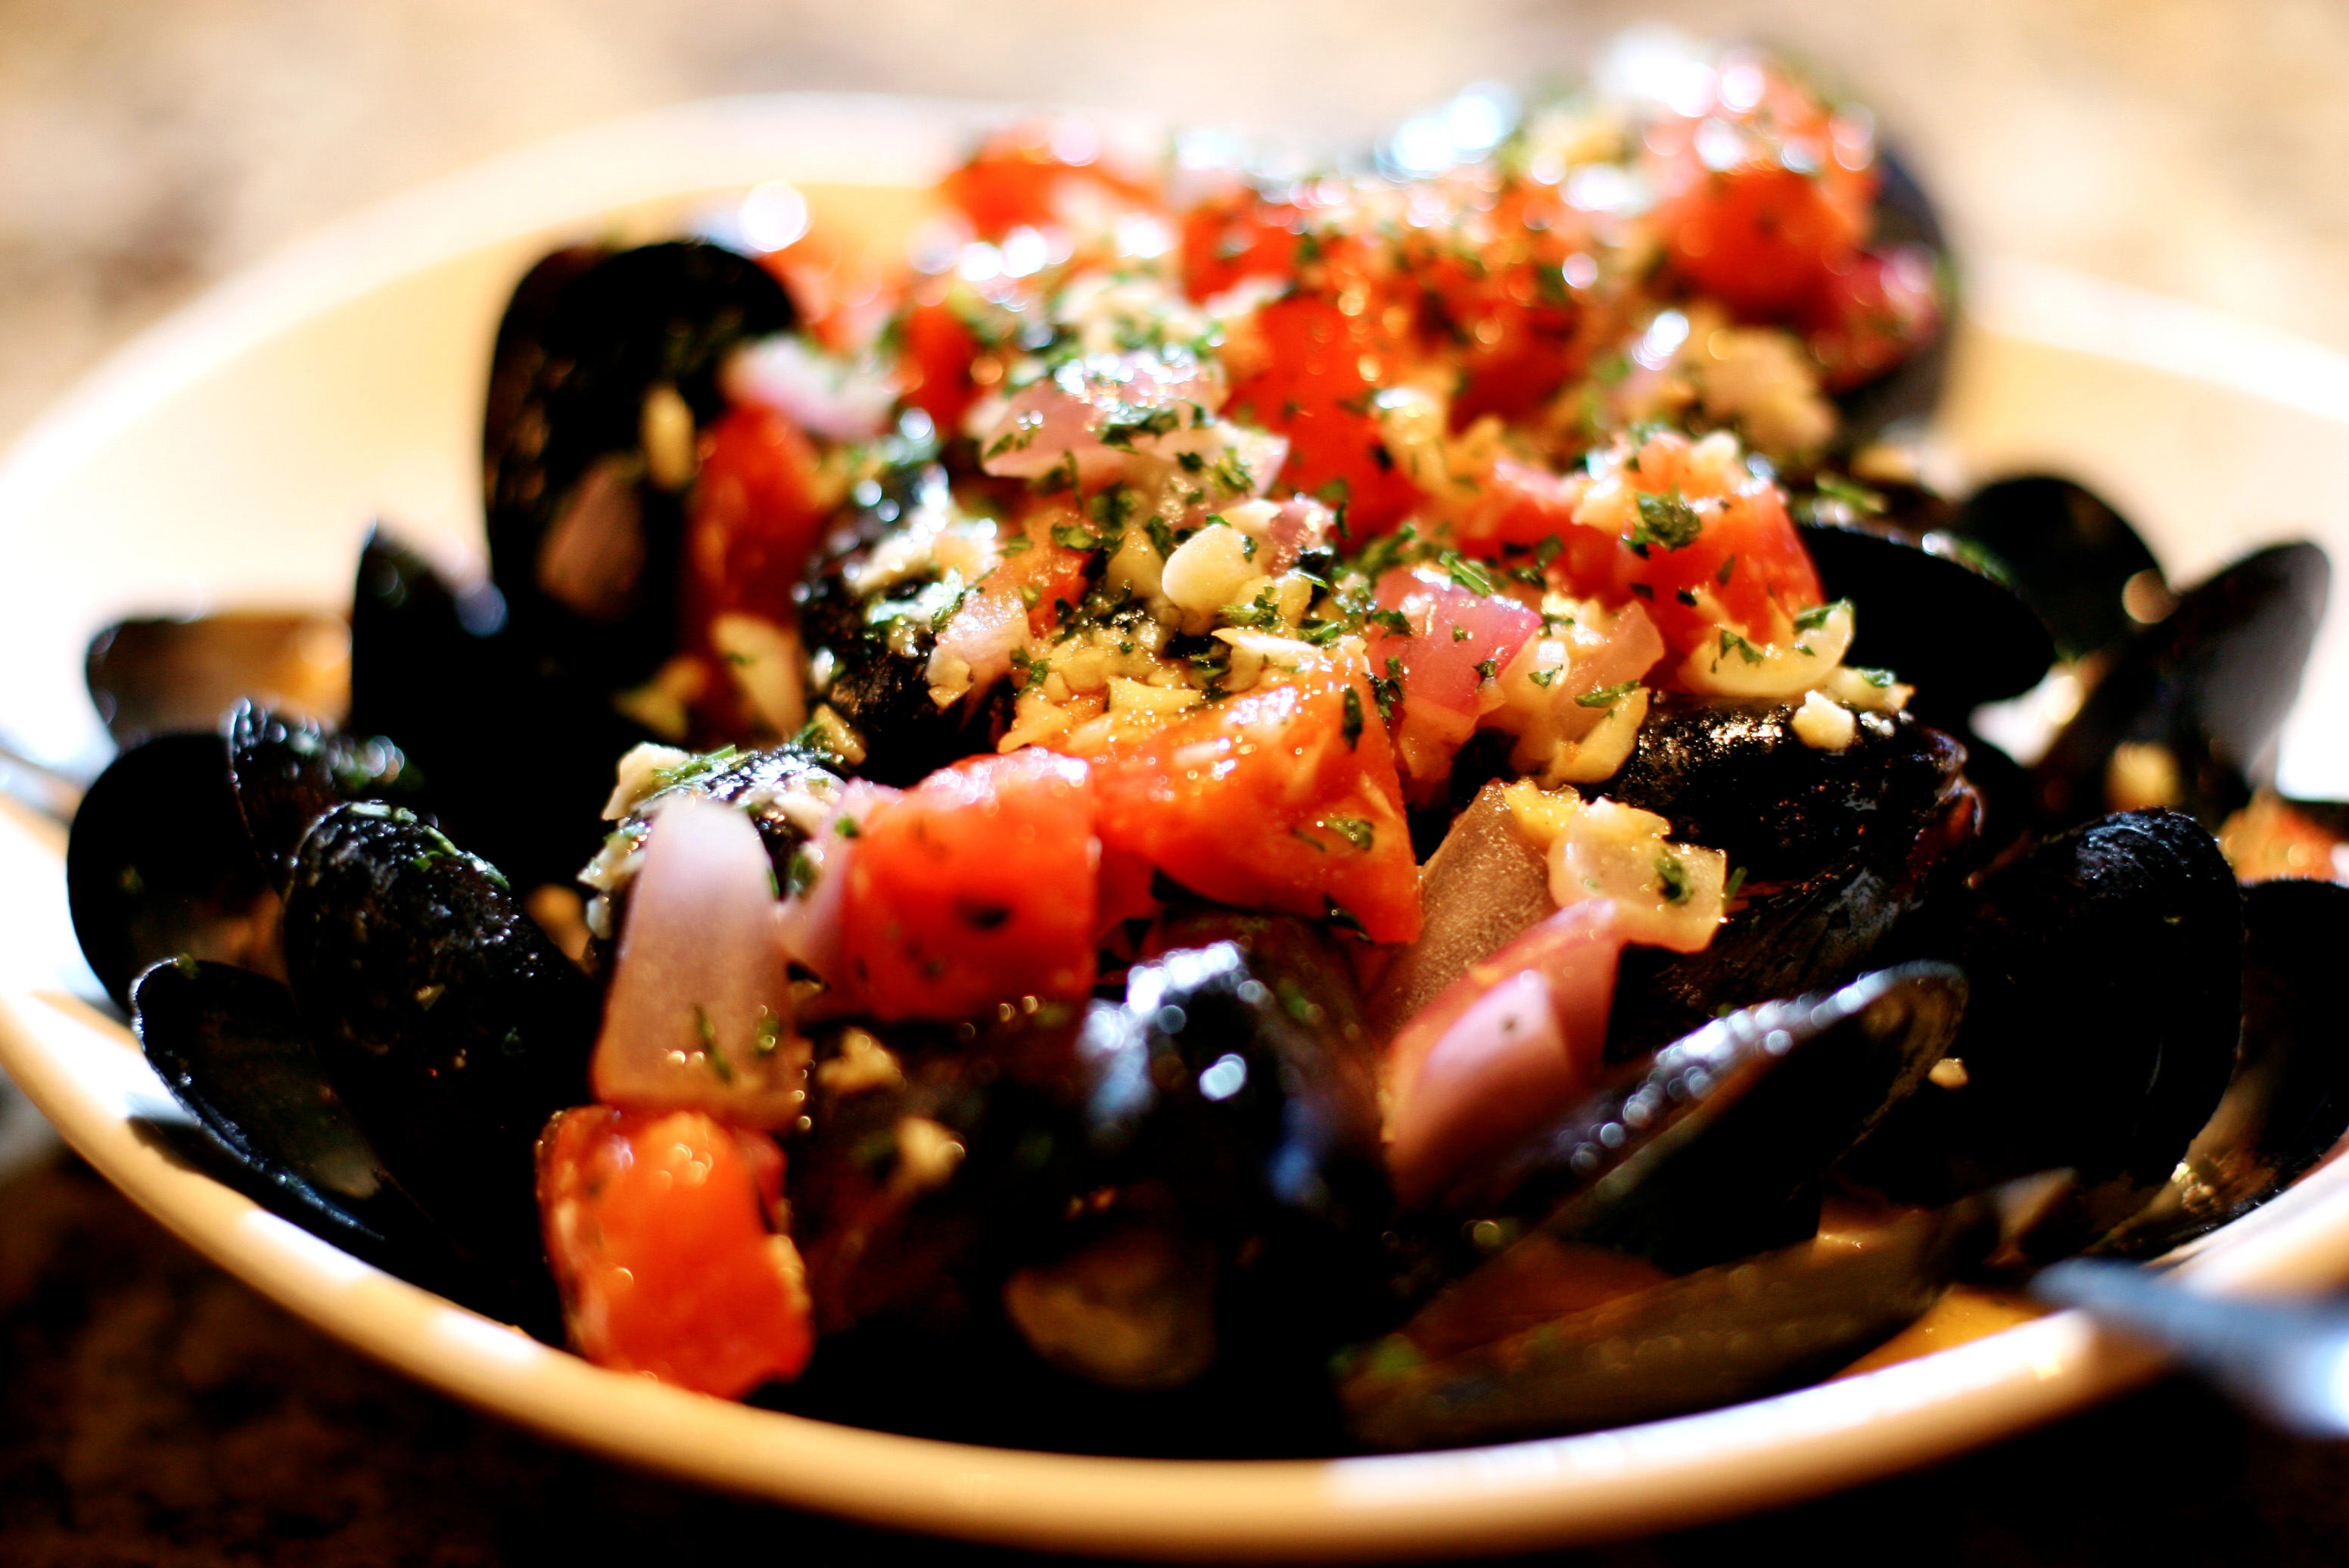 Mussels Josephine; tomatoes, garlic, basil - lemon wine sauce at Bonefish Grill in Boynton Beach.